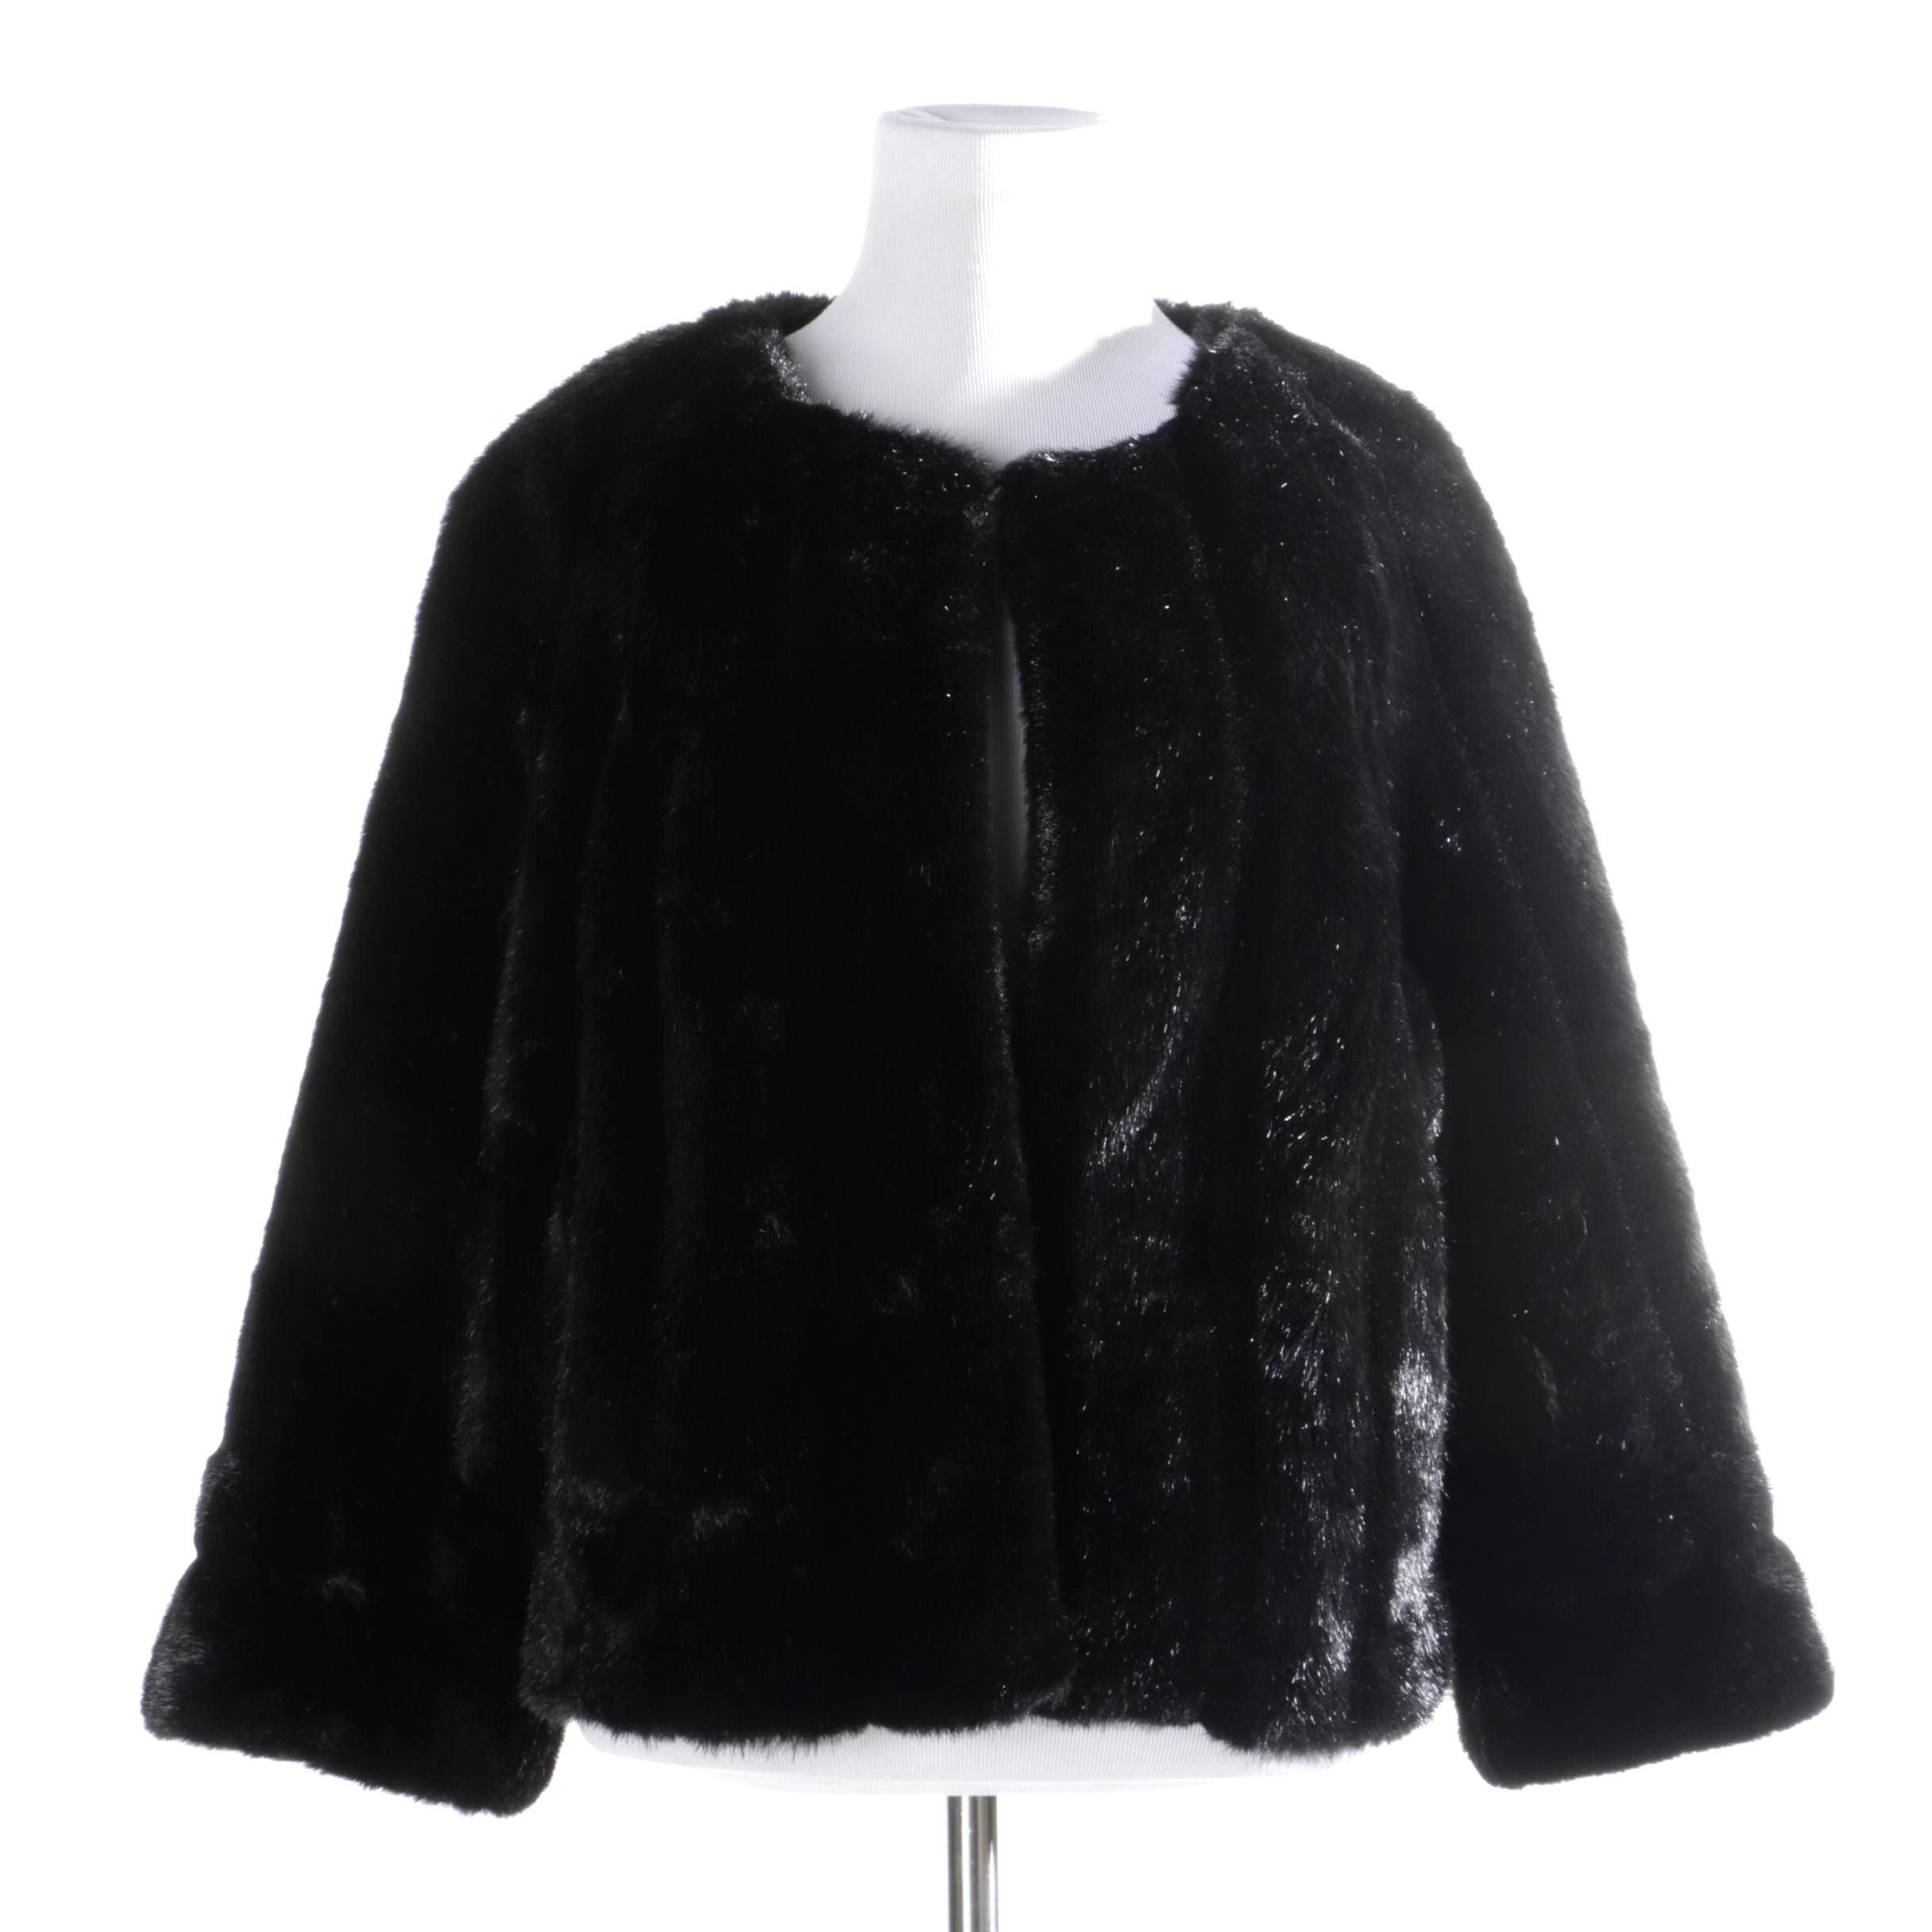 A.n.a Black Faux Fur Jacket